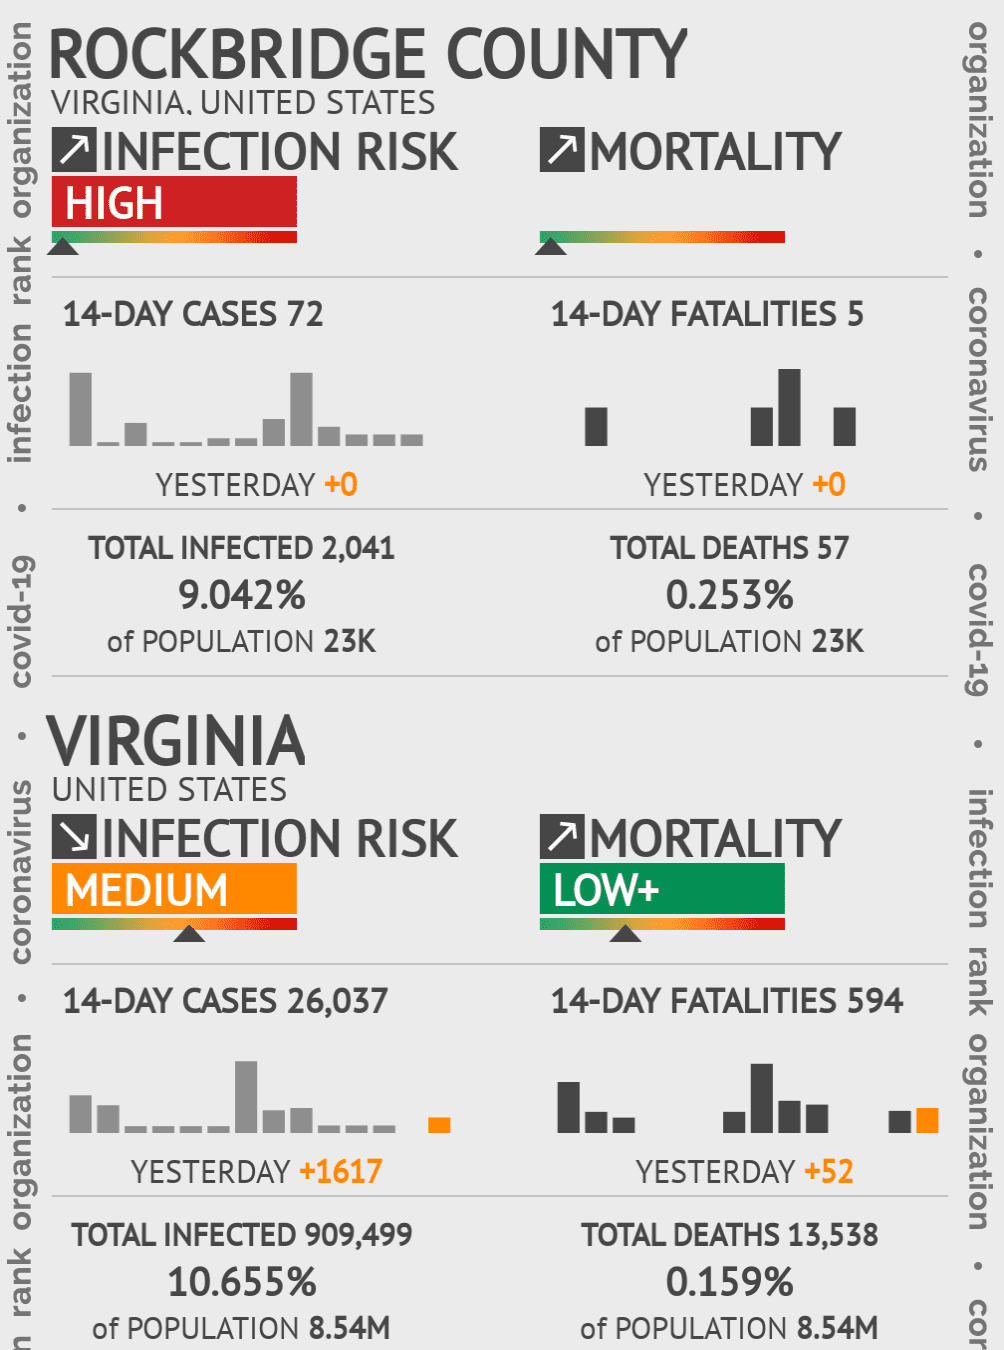 Rockbridge County Coronavirus Covid-19 Risk of Infection on July 24, 2021